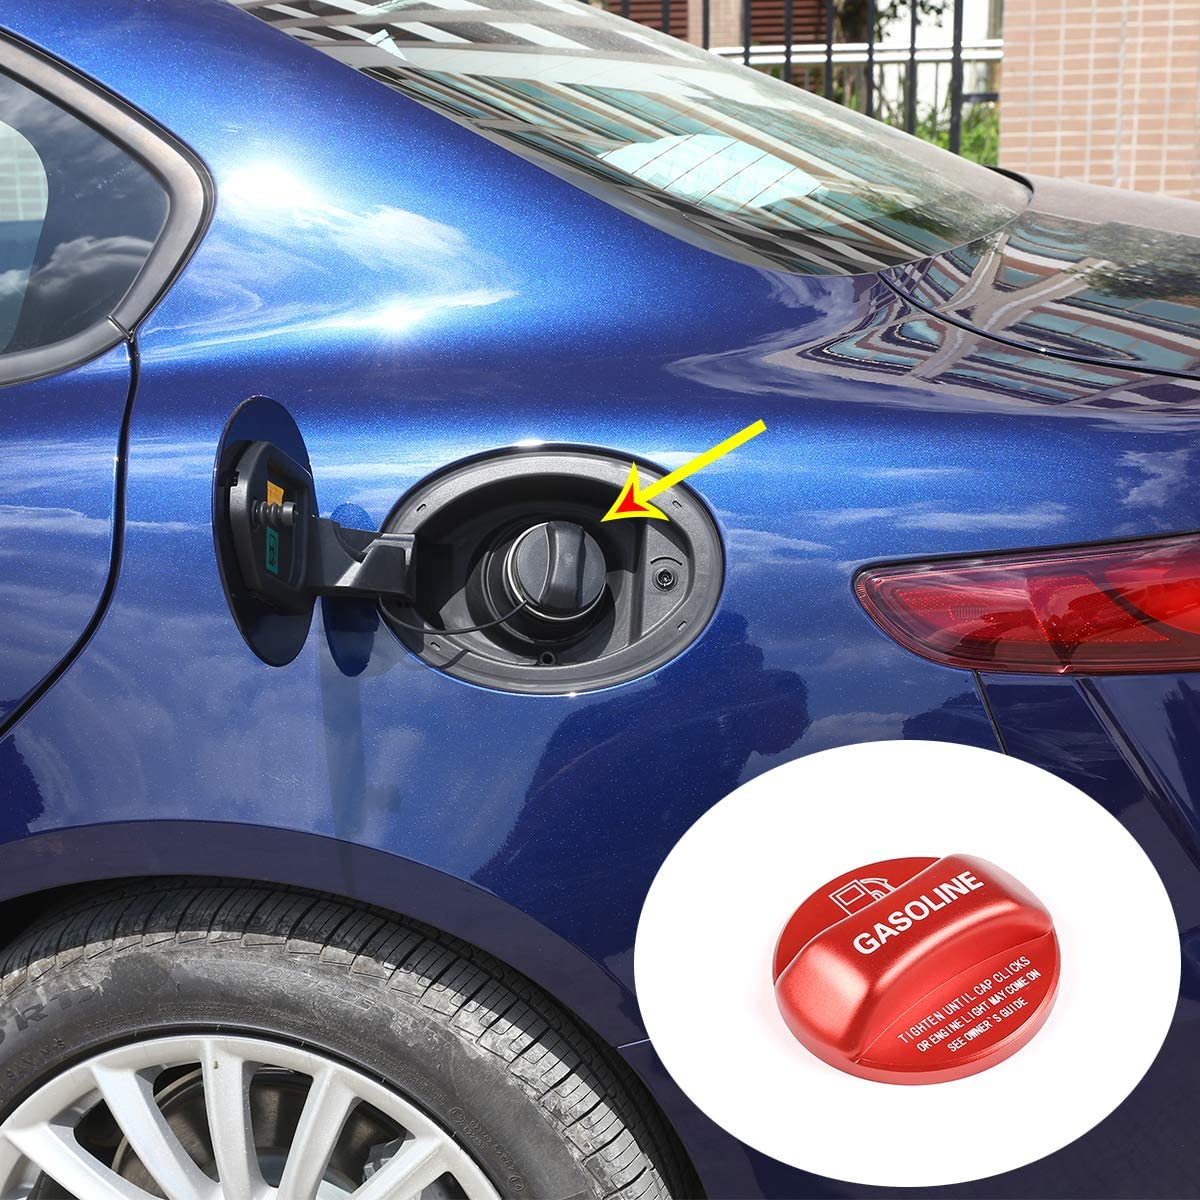 YIWANG Aluminum Alloy Gasoline Fuel Tank Cap Cover Trim For Alfa Romeo Giulia